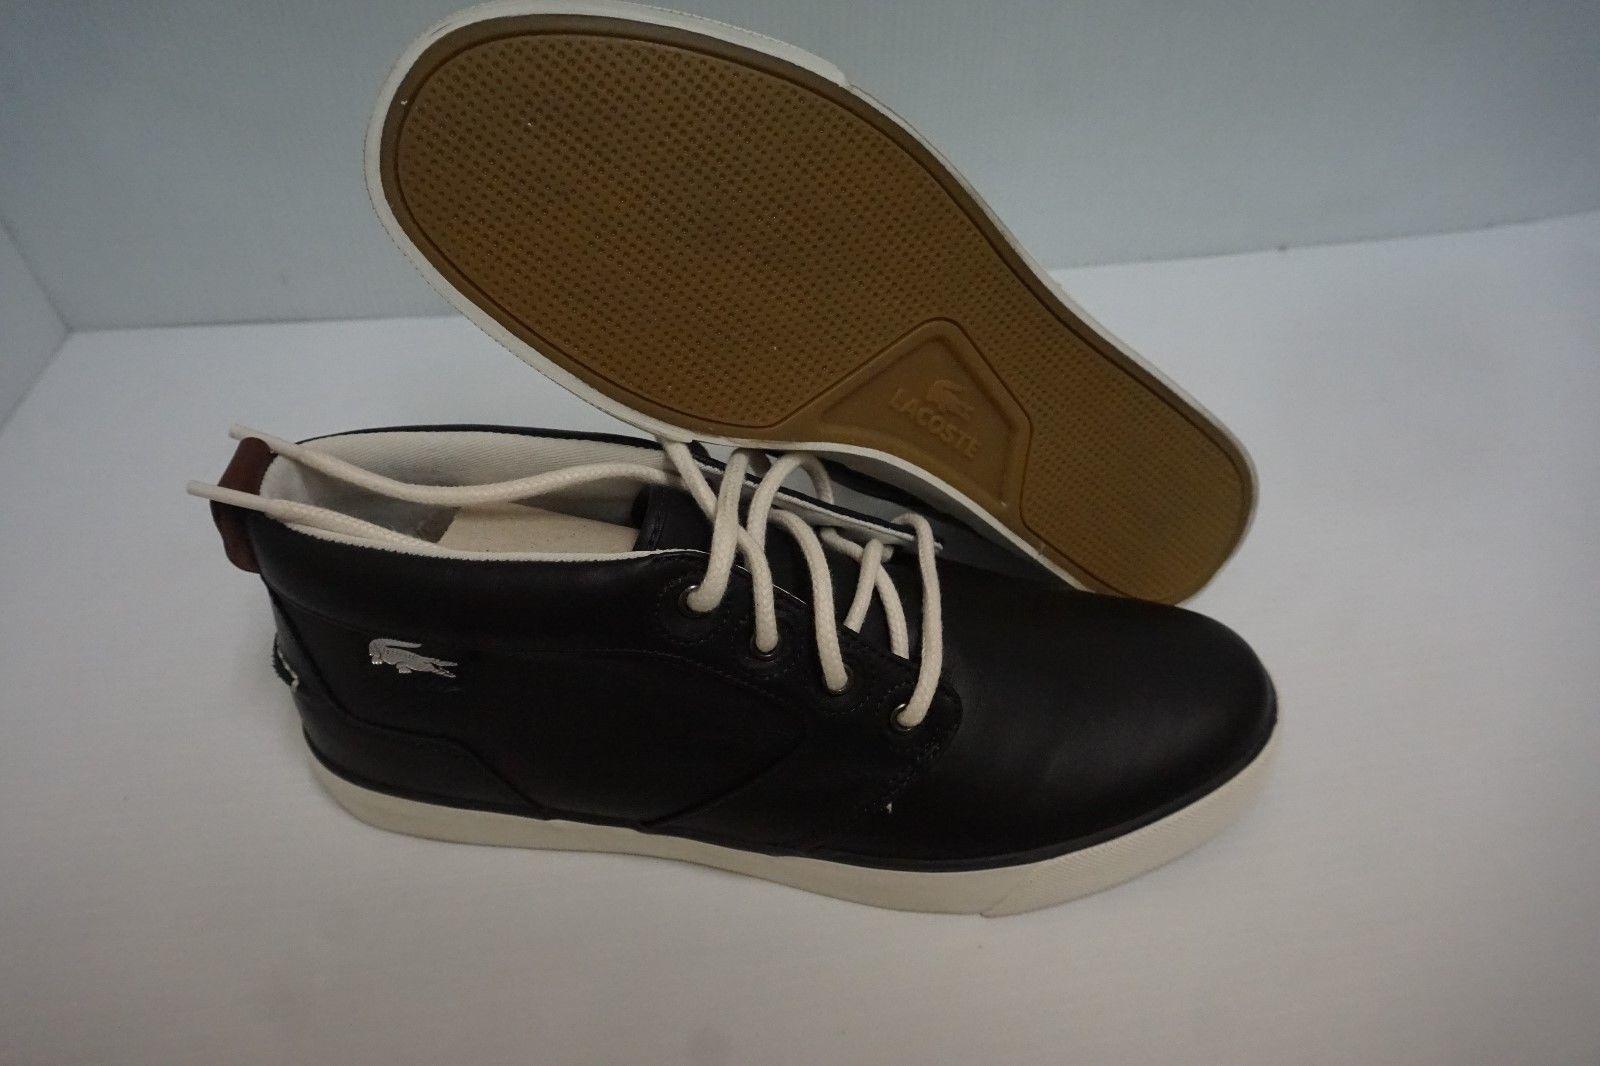 f20a672af Lacoste men s shoes storm GC stm black and 33 similar items. 57